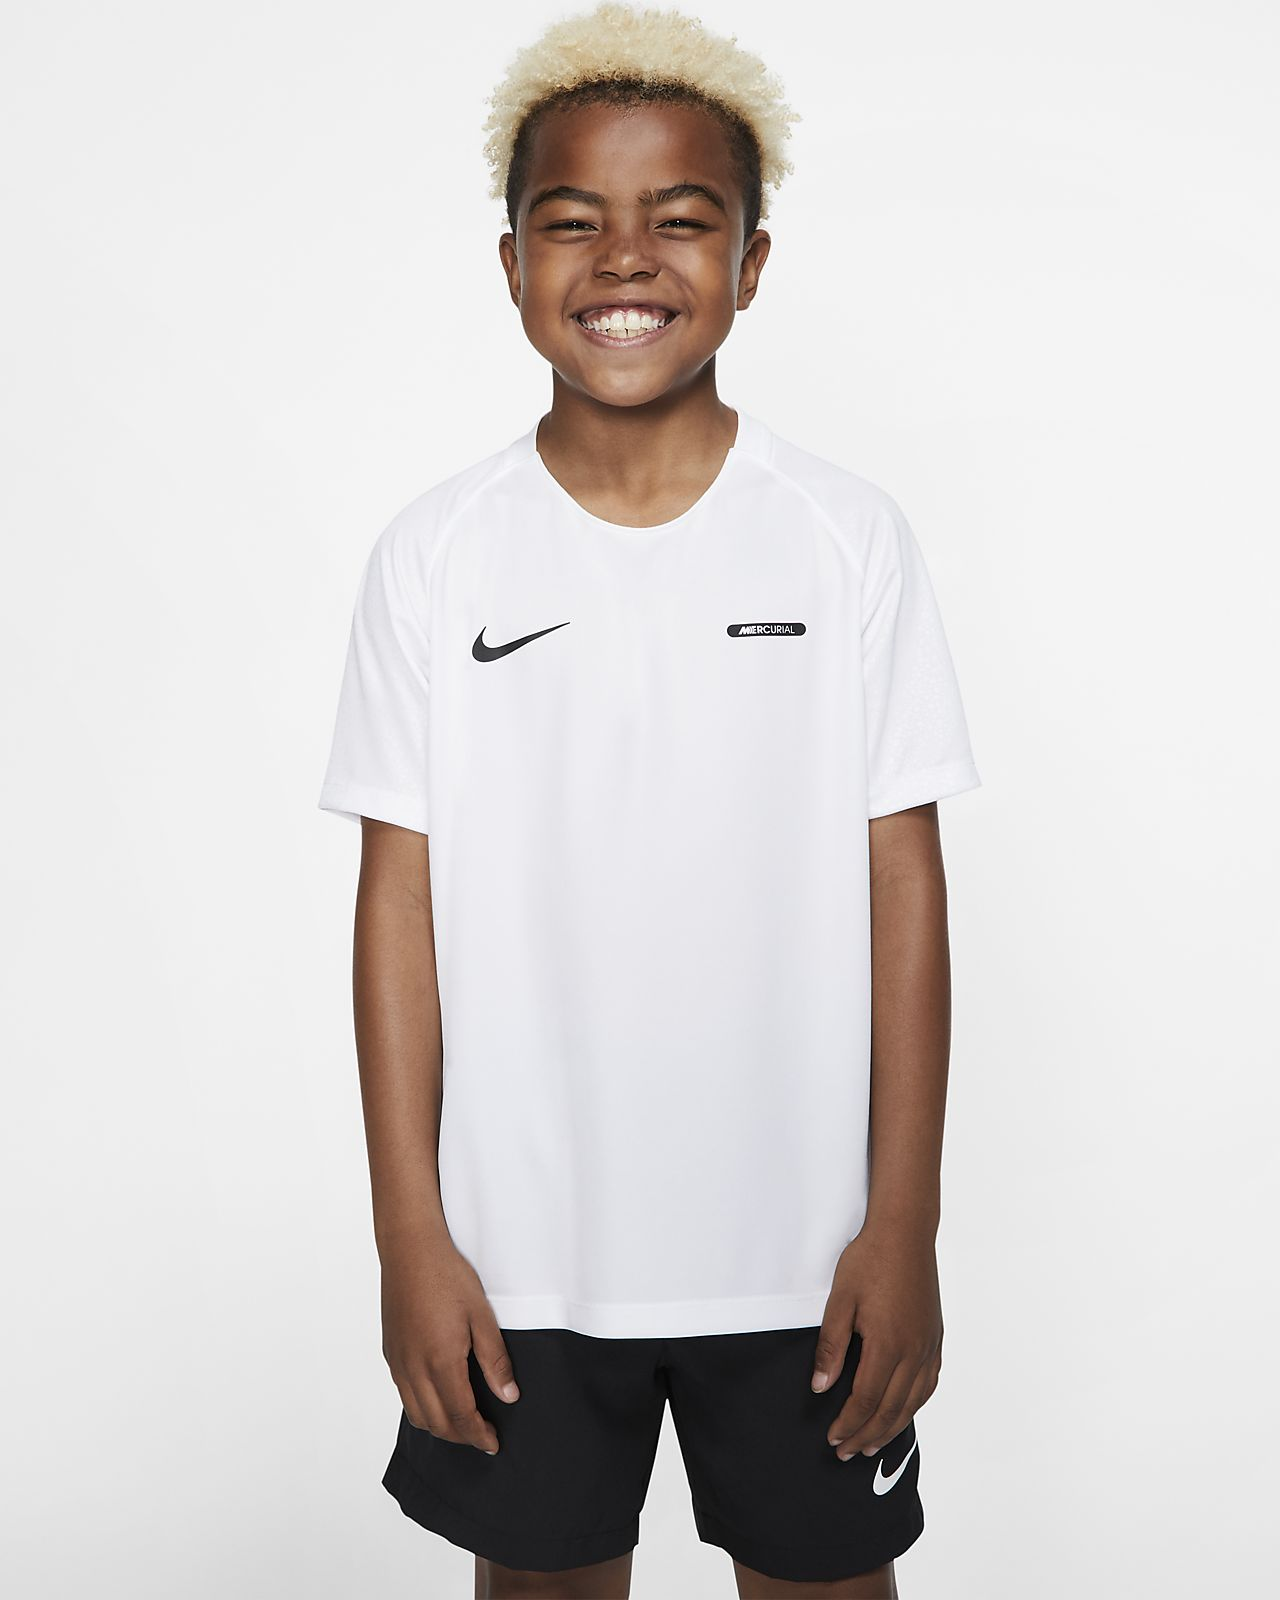 Nike Dri-FIT Mercurial耐克刺客系列大童(男孩)短袖足球上衣